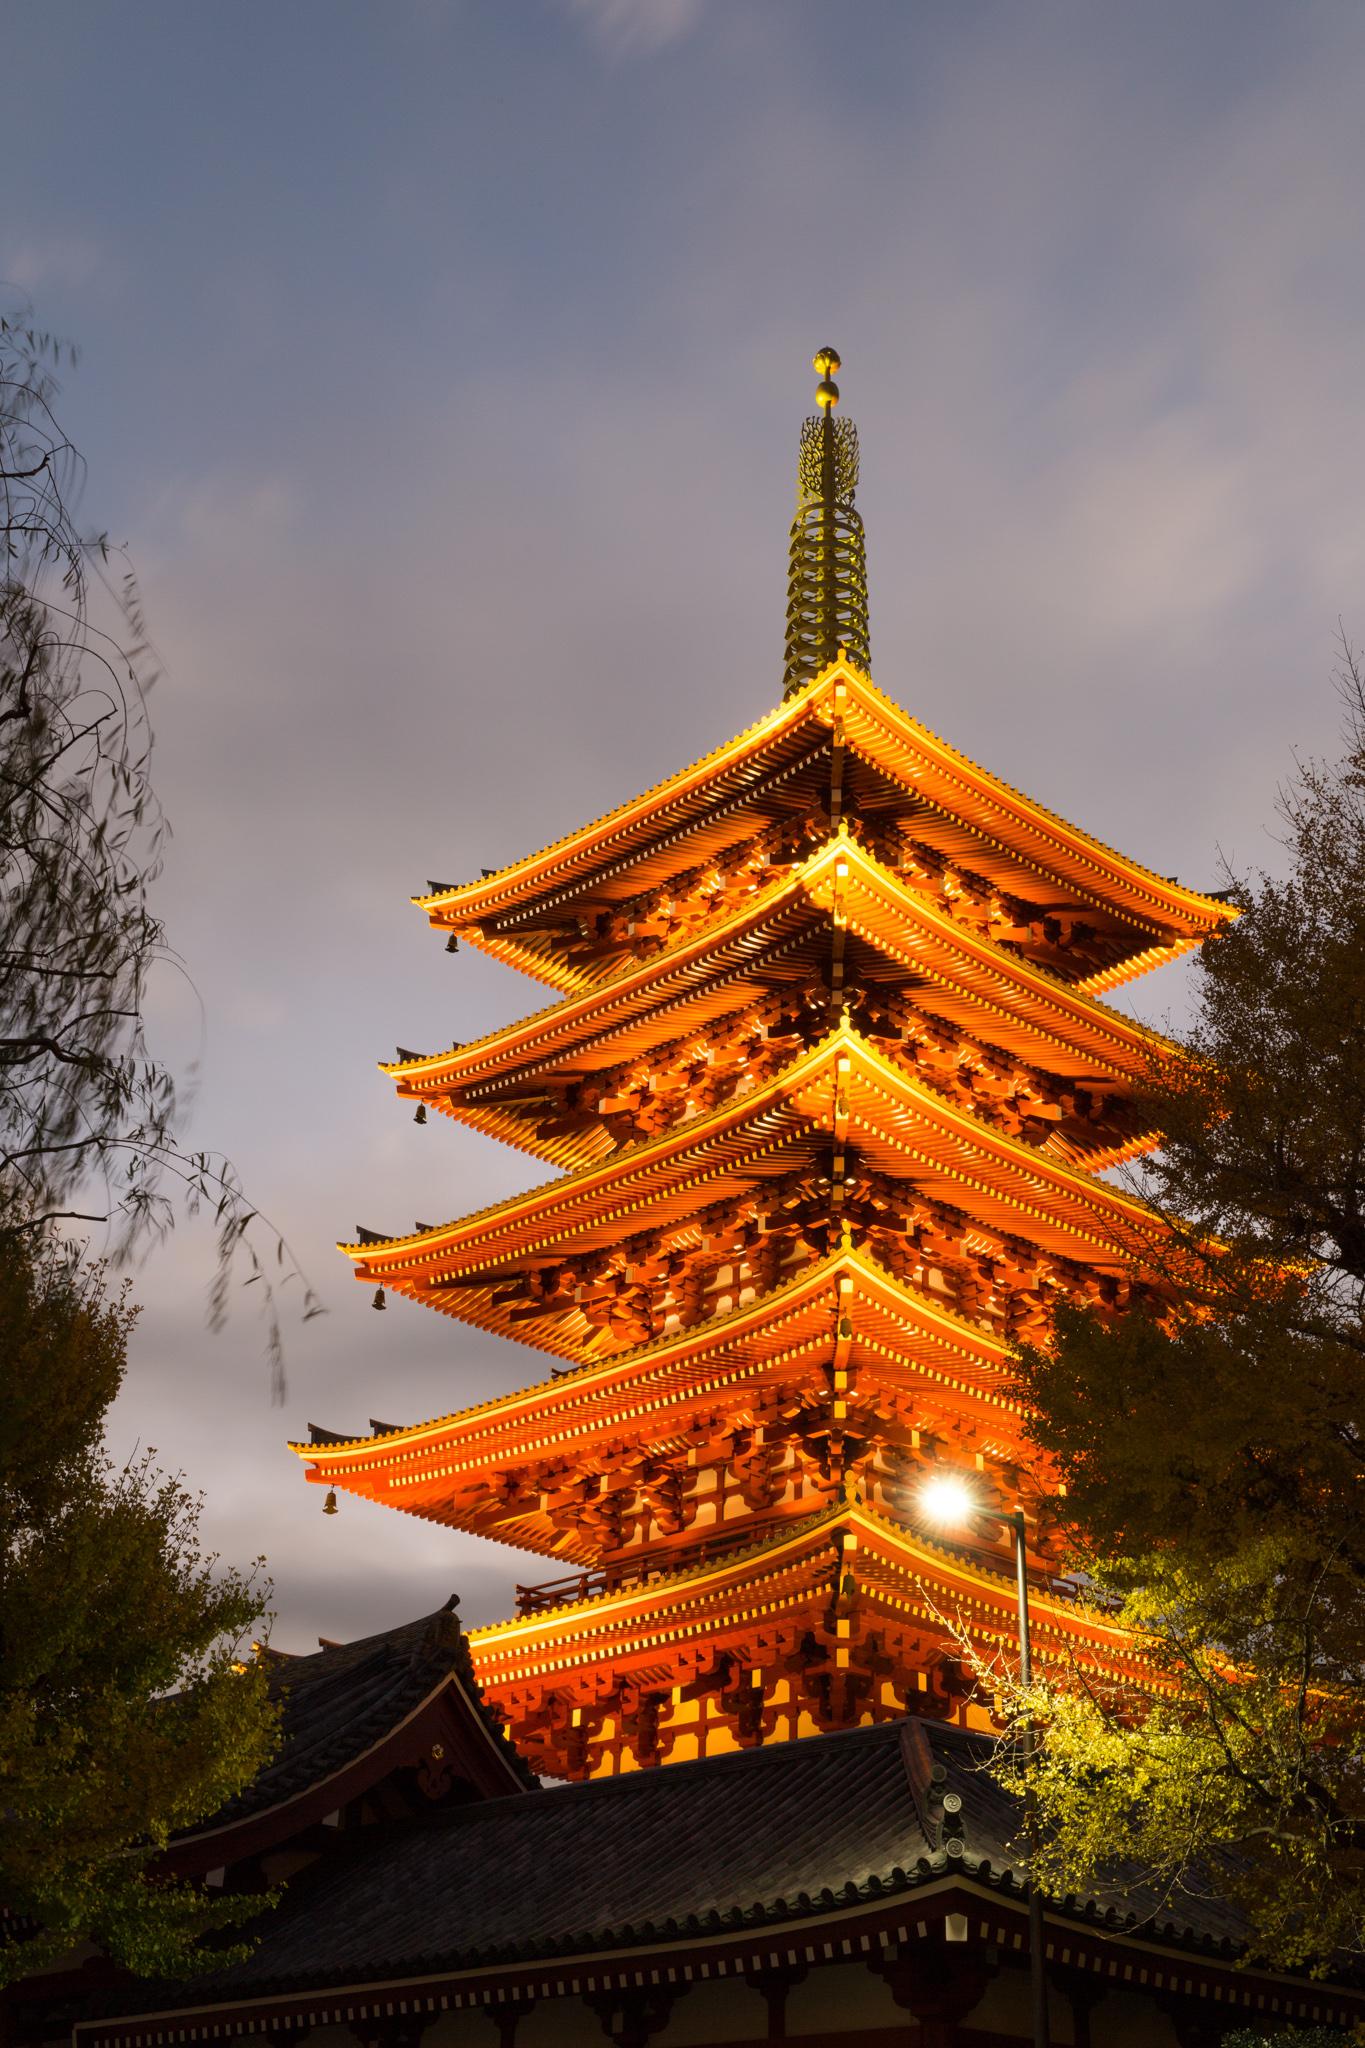 5866-japan-urban-autumn-lights.jpg